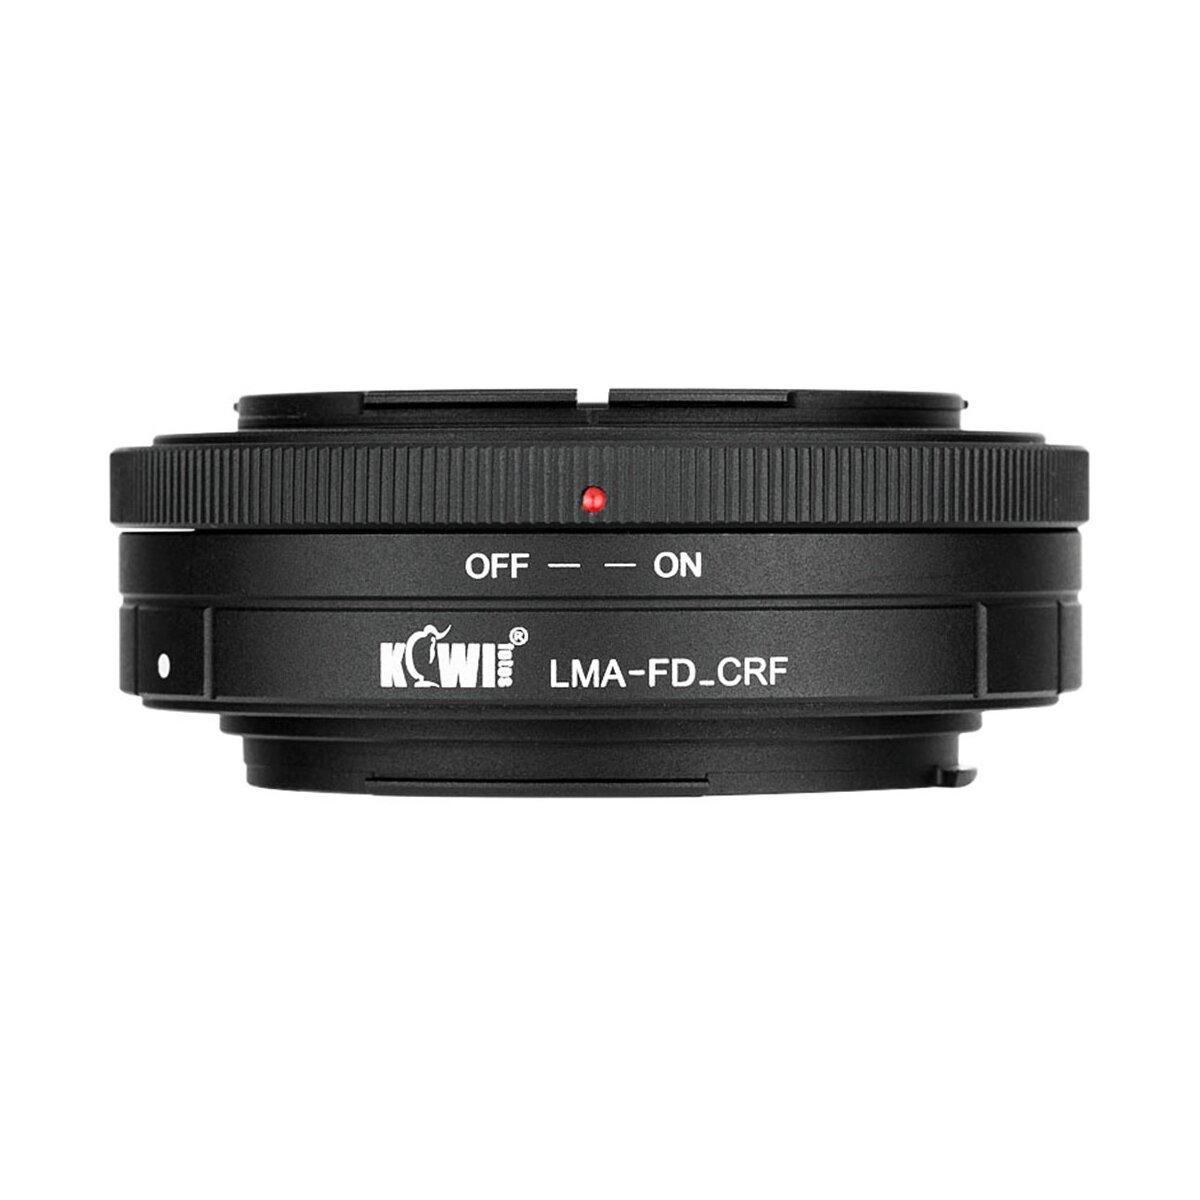 Kiwi LMA-FD-CRF Objektivadapter, Adapterring   Konverter Canon FD zu Canon RF, Kompatibel mit Canon FD-Objektive auf Canon EOS R Kameras